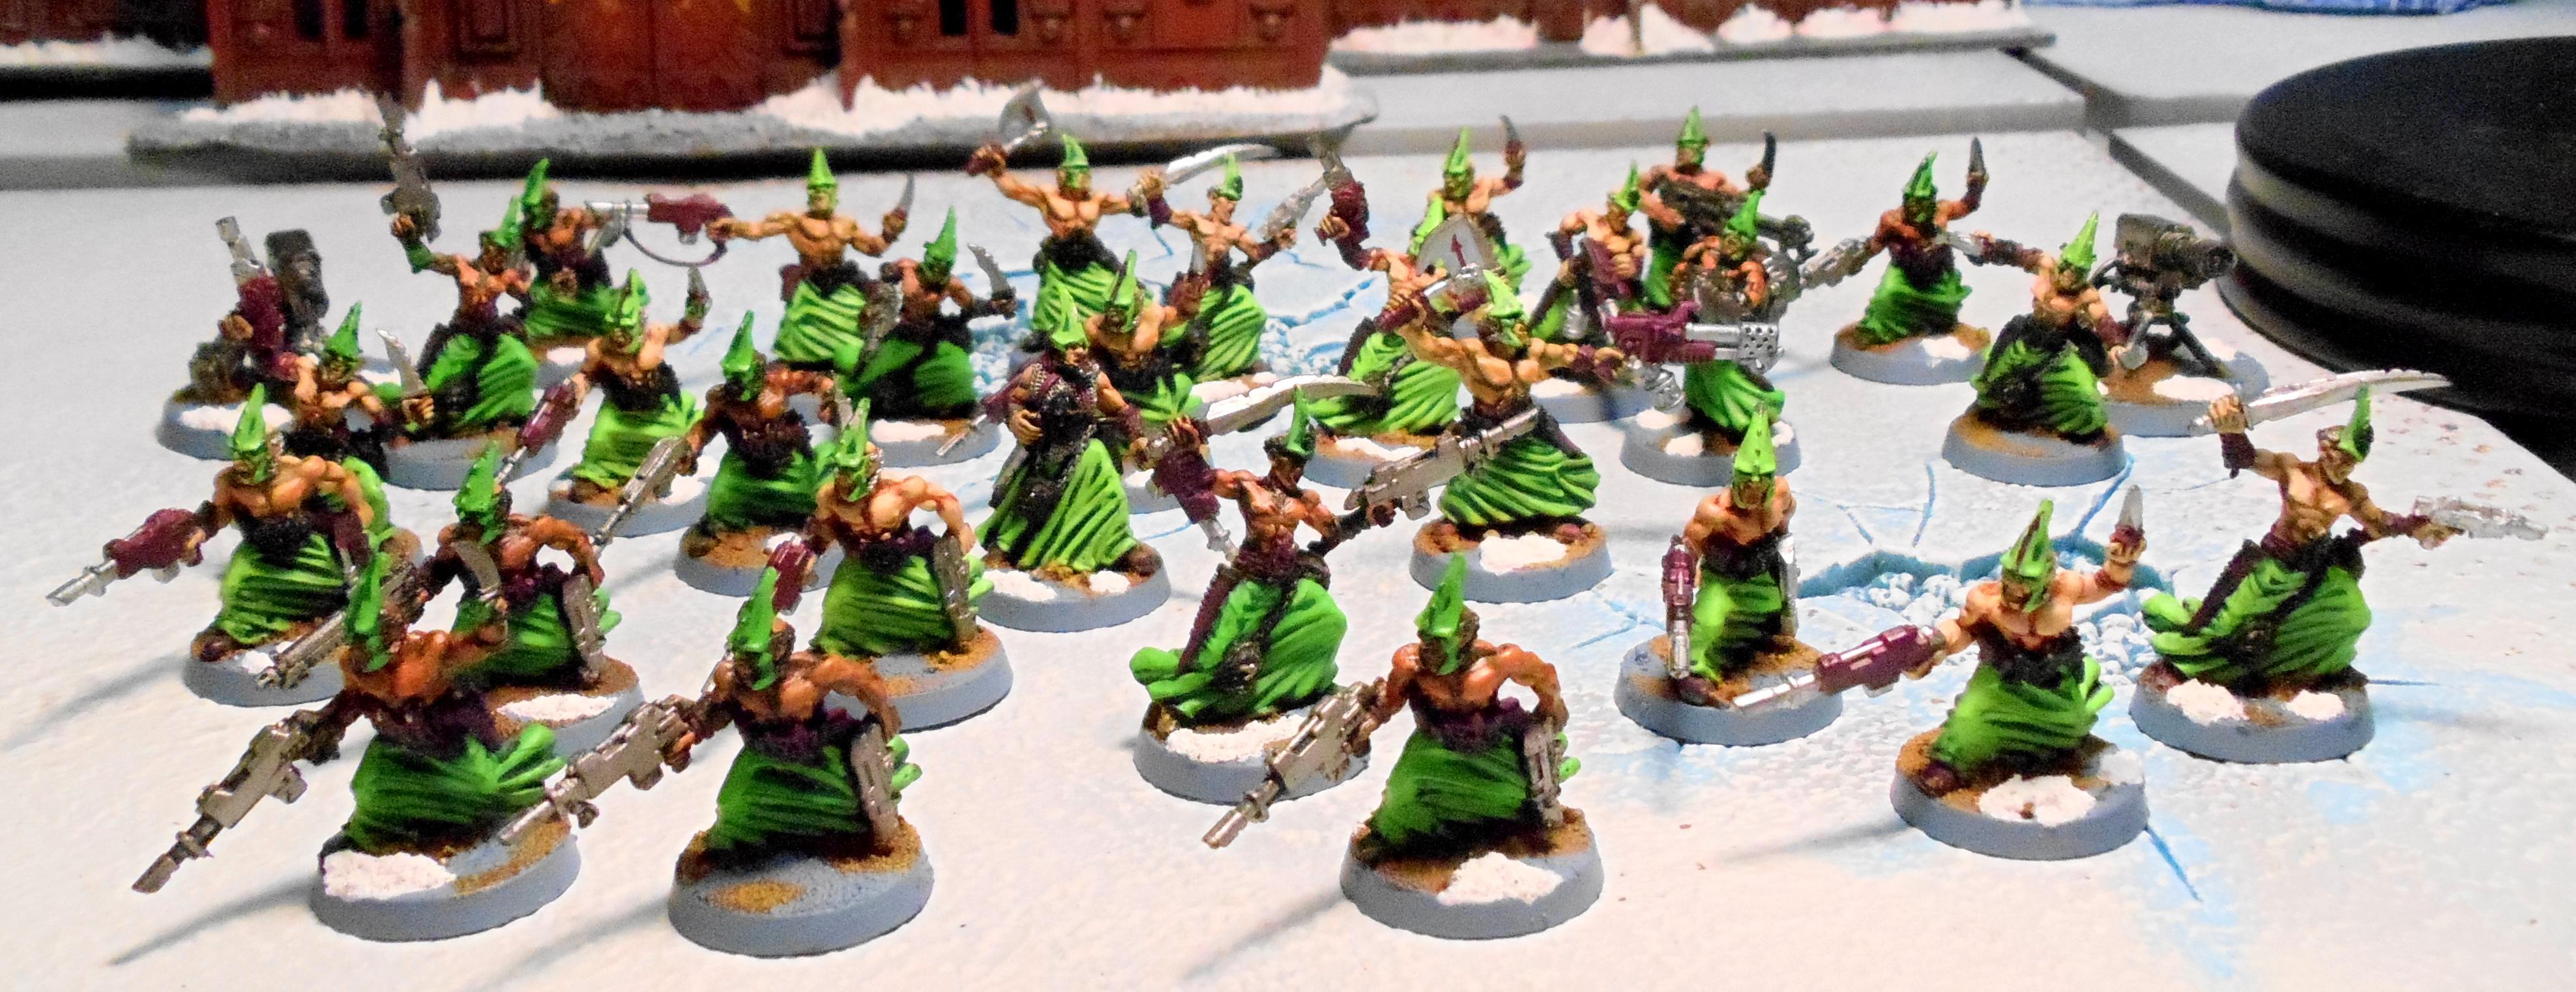 Chaos, Chaos Space Marines, Daemonhunters, Renegade